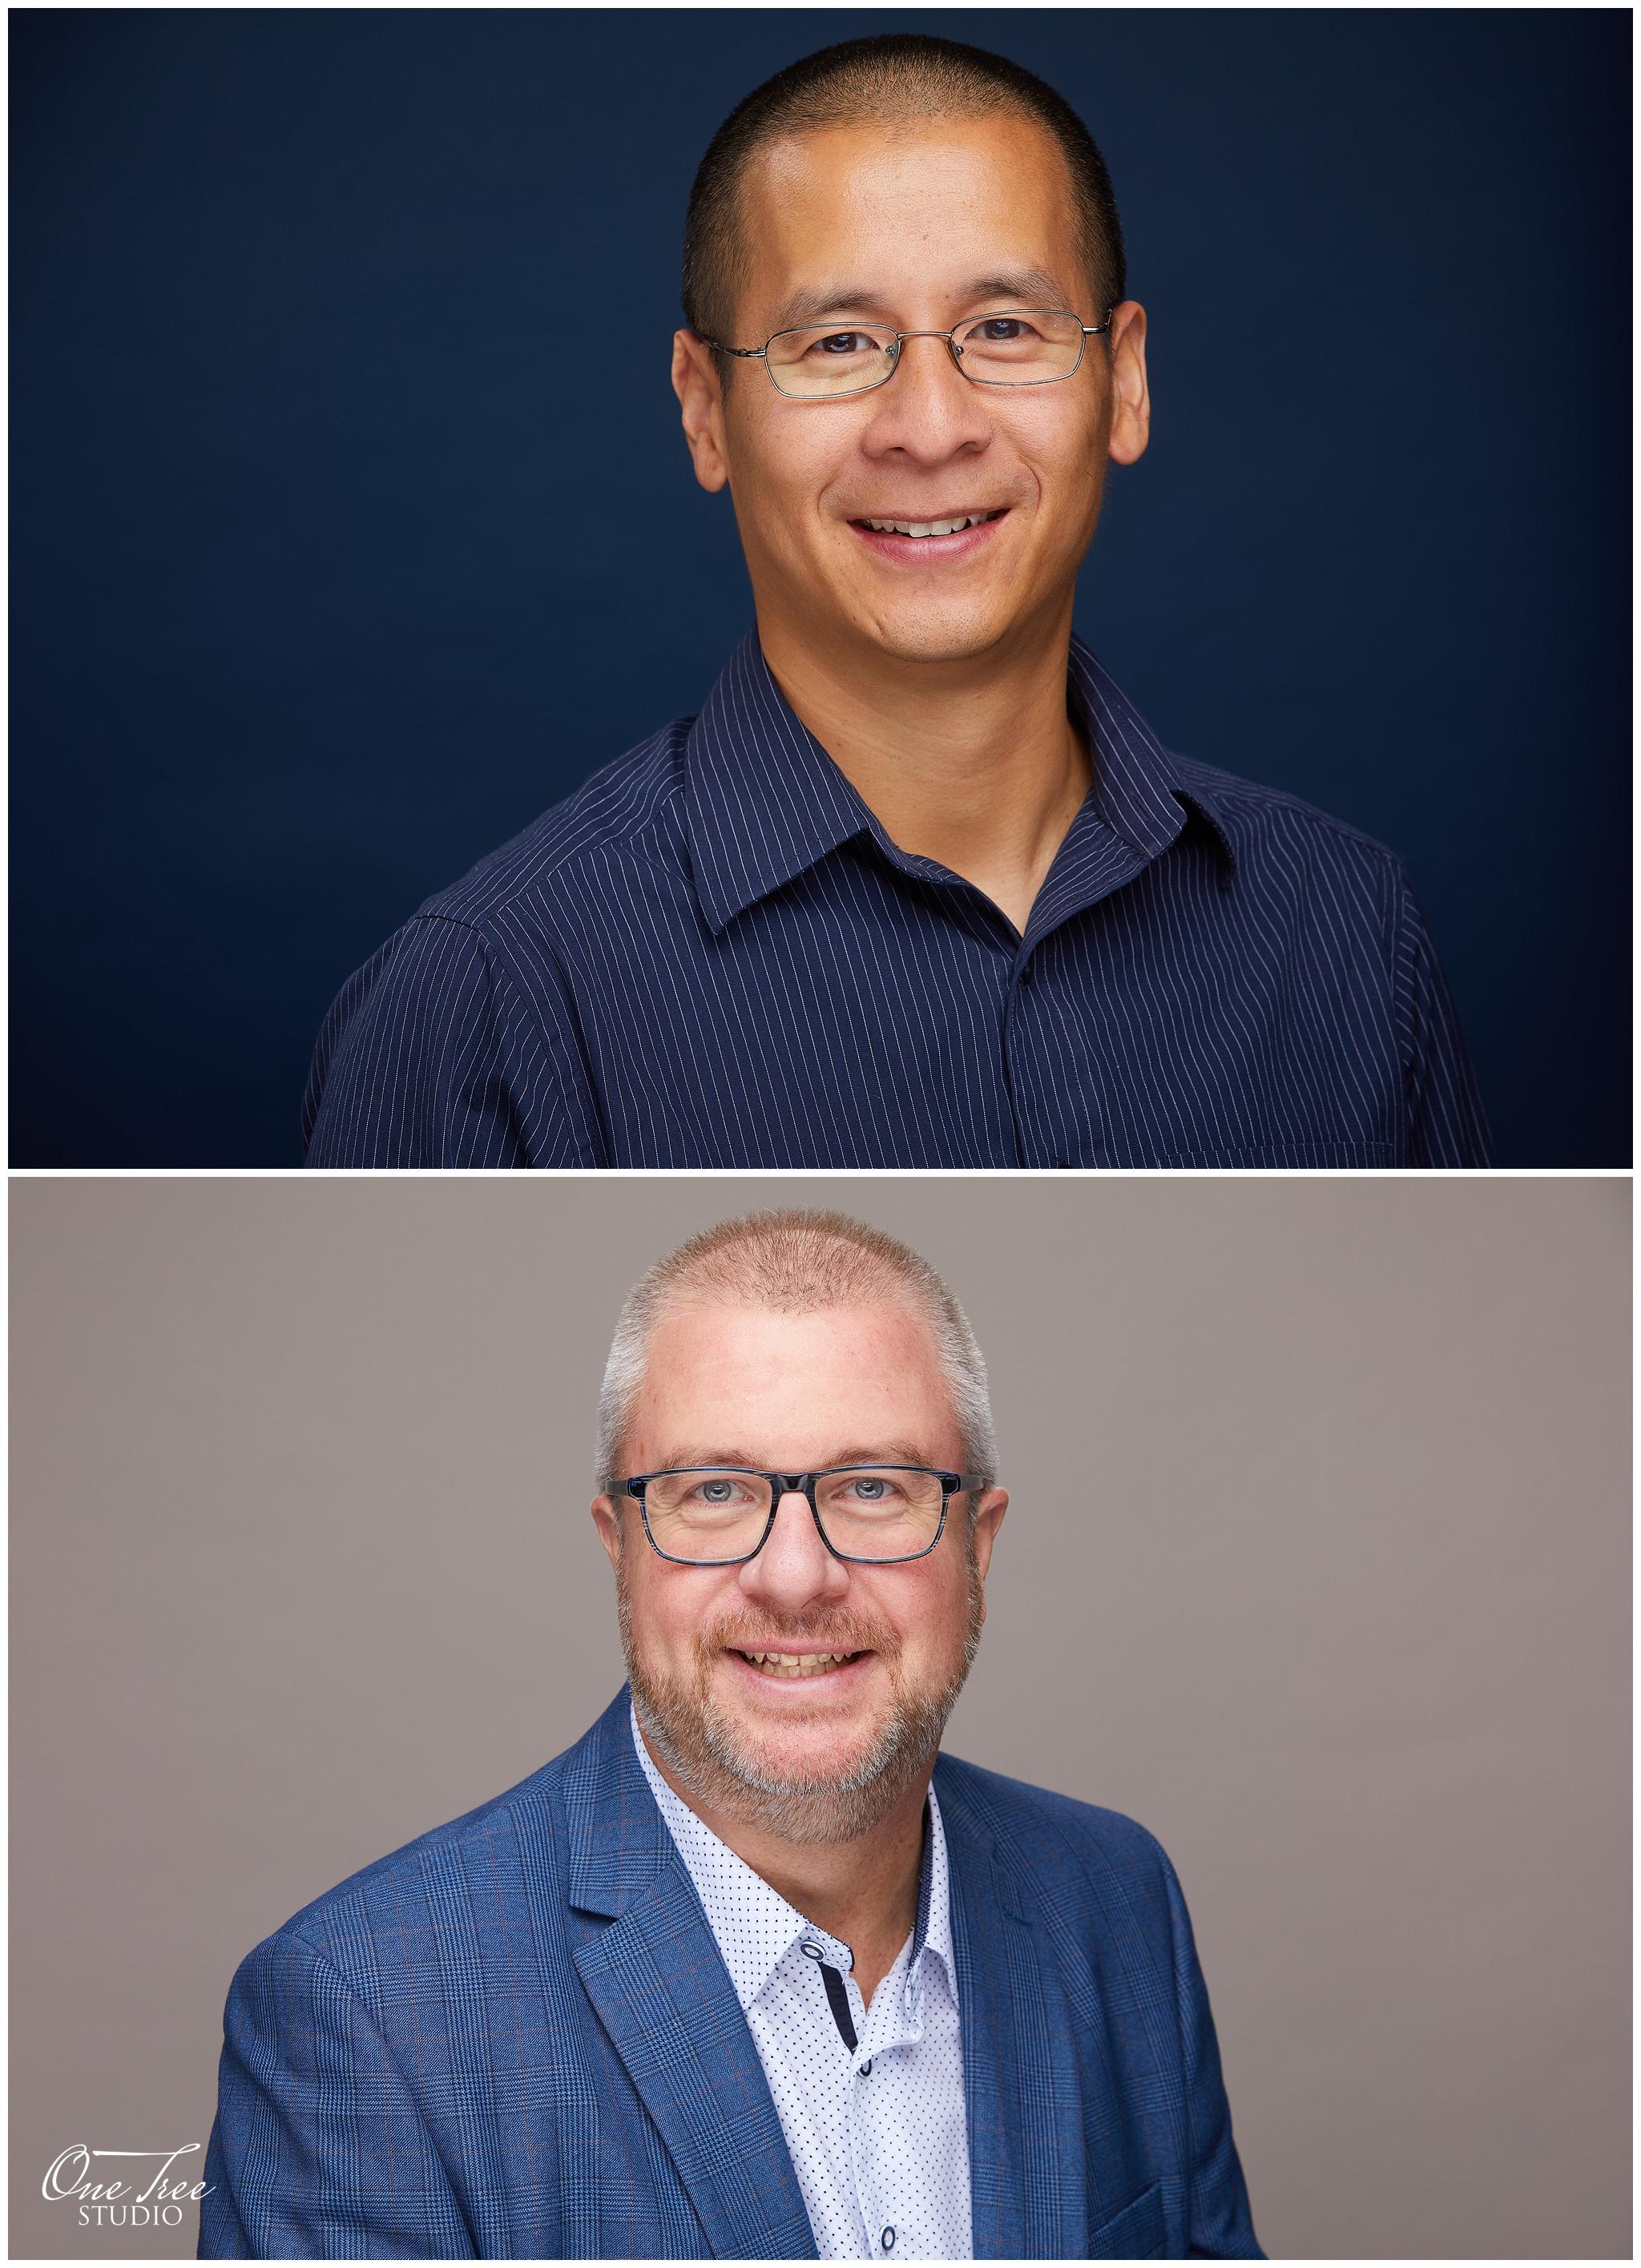 Toronto Conference Headshot Photographer